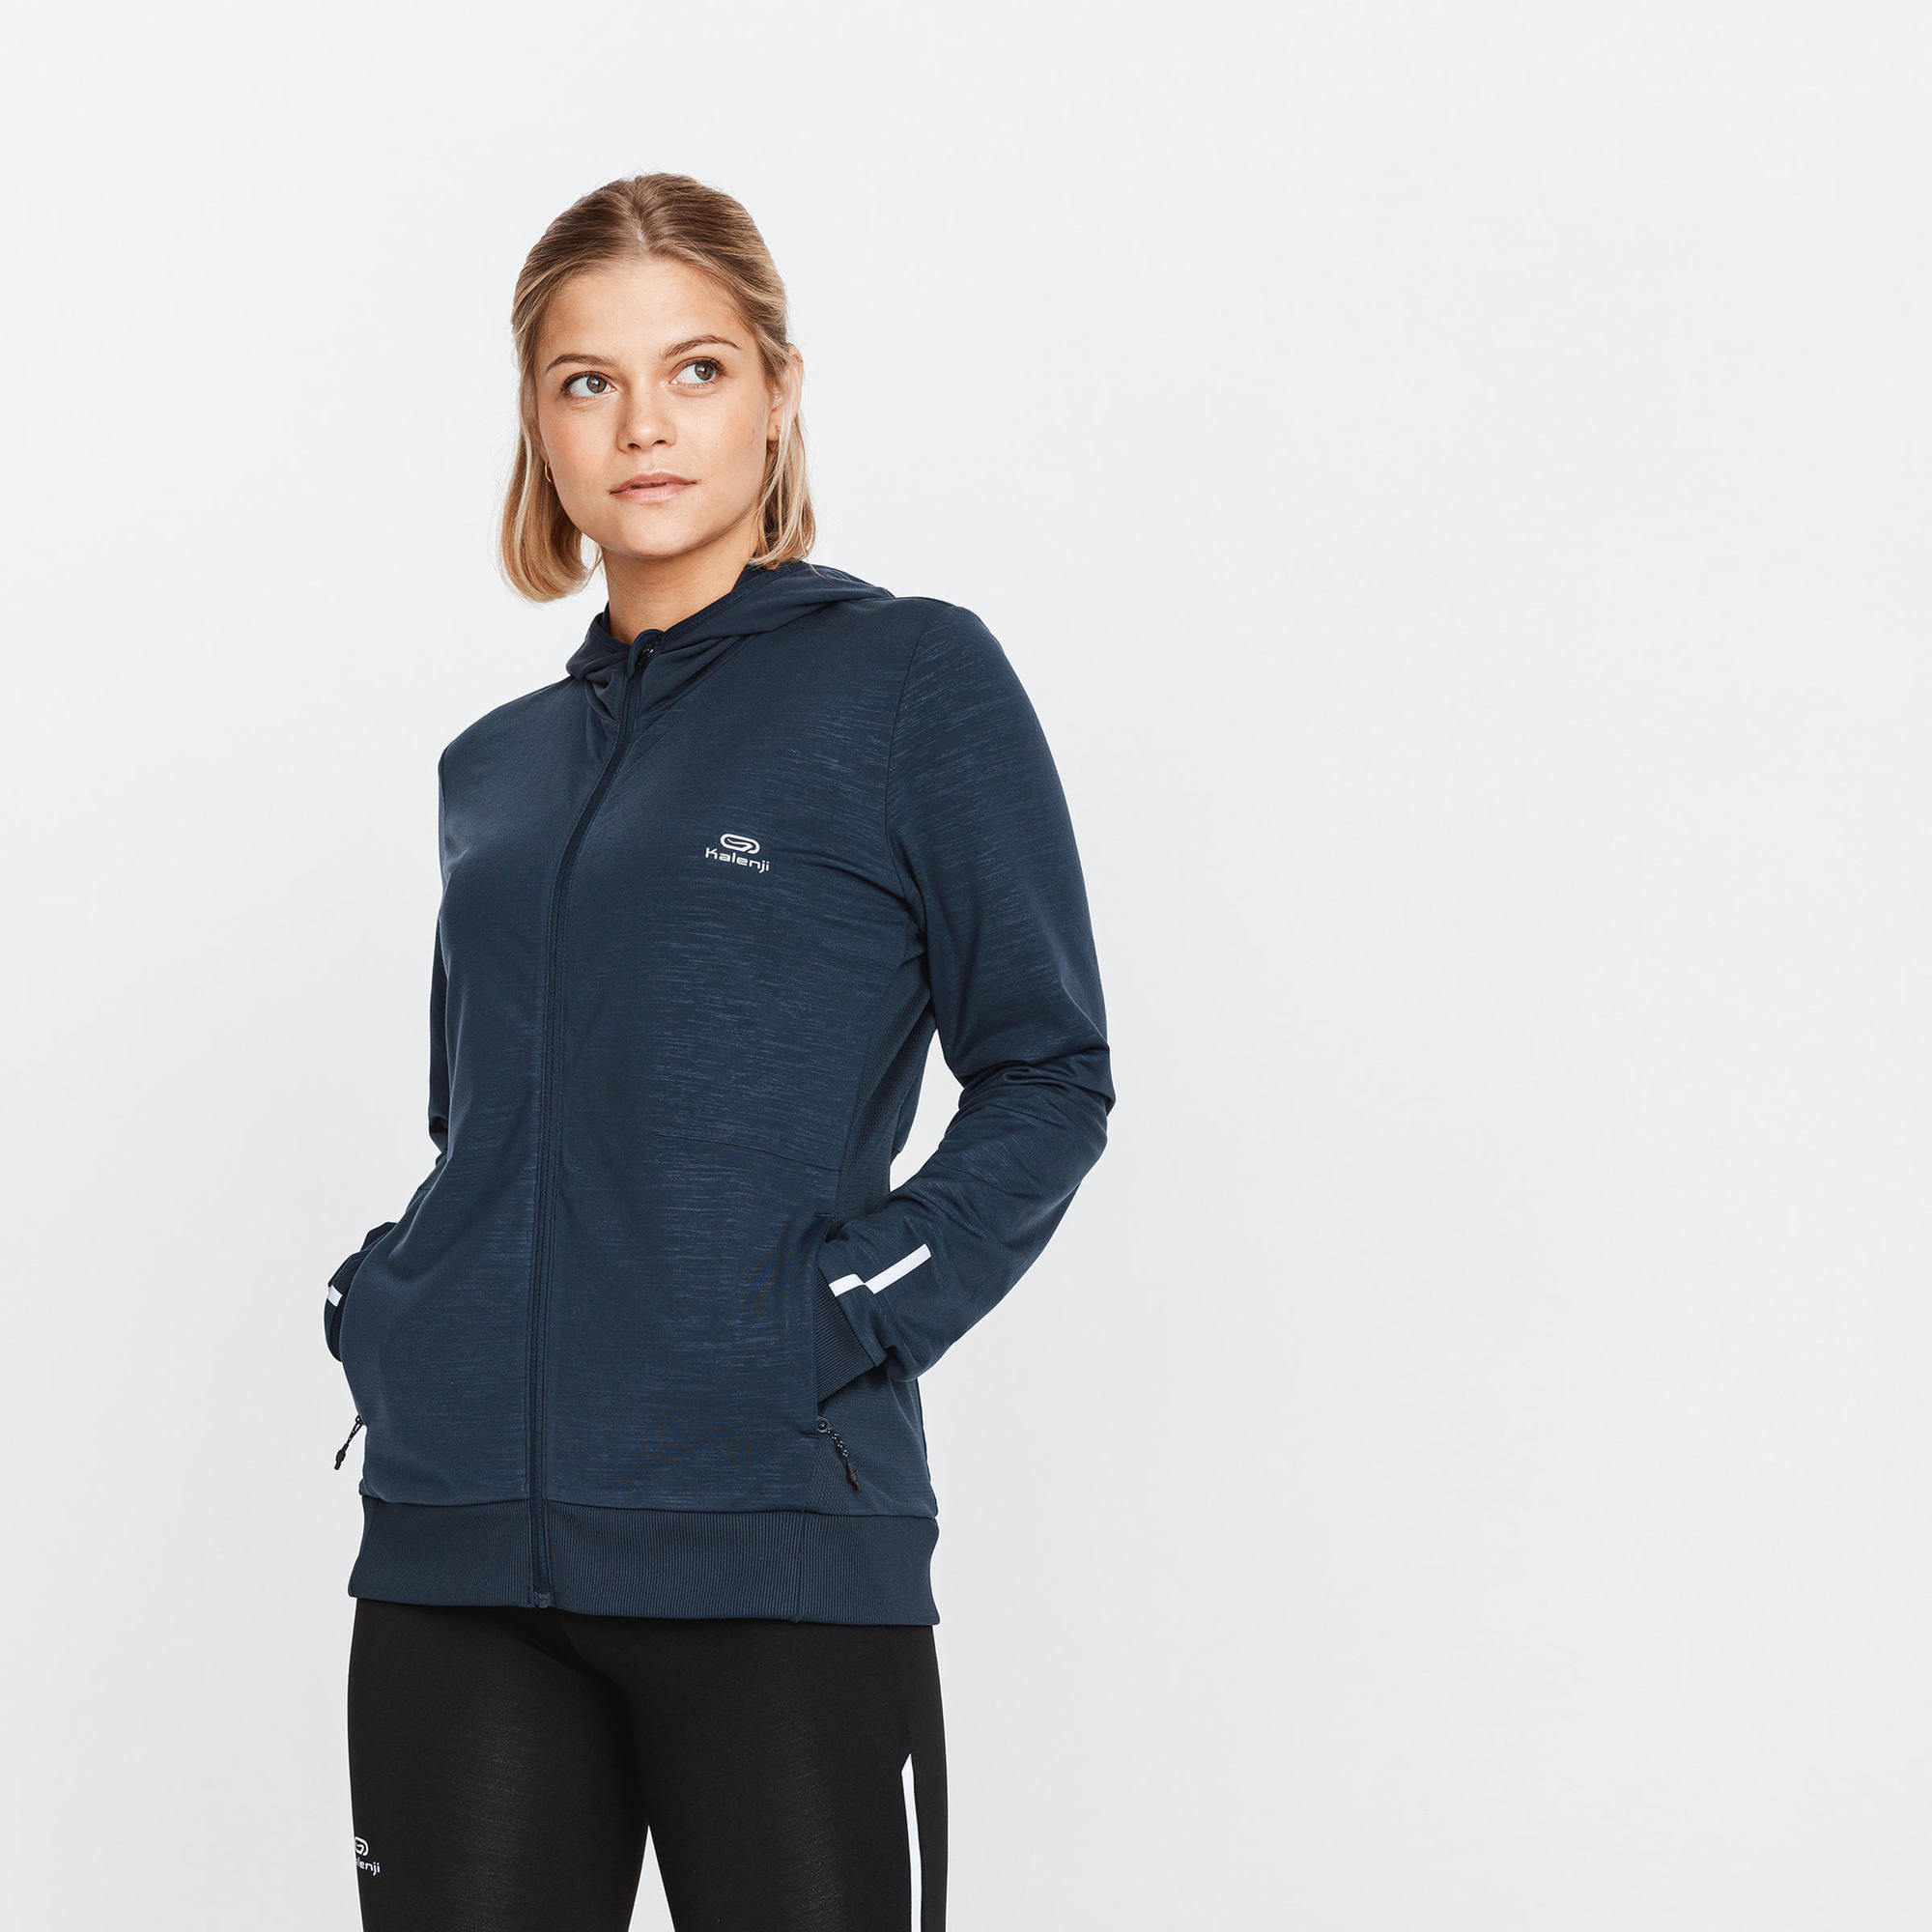 Bluza do biegania damska Kalenji Run Warm ocieplana